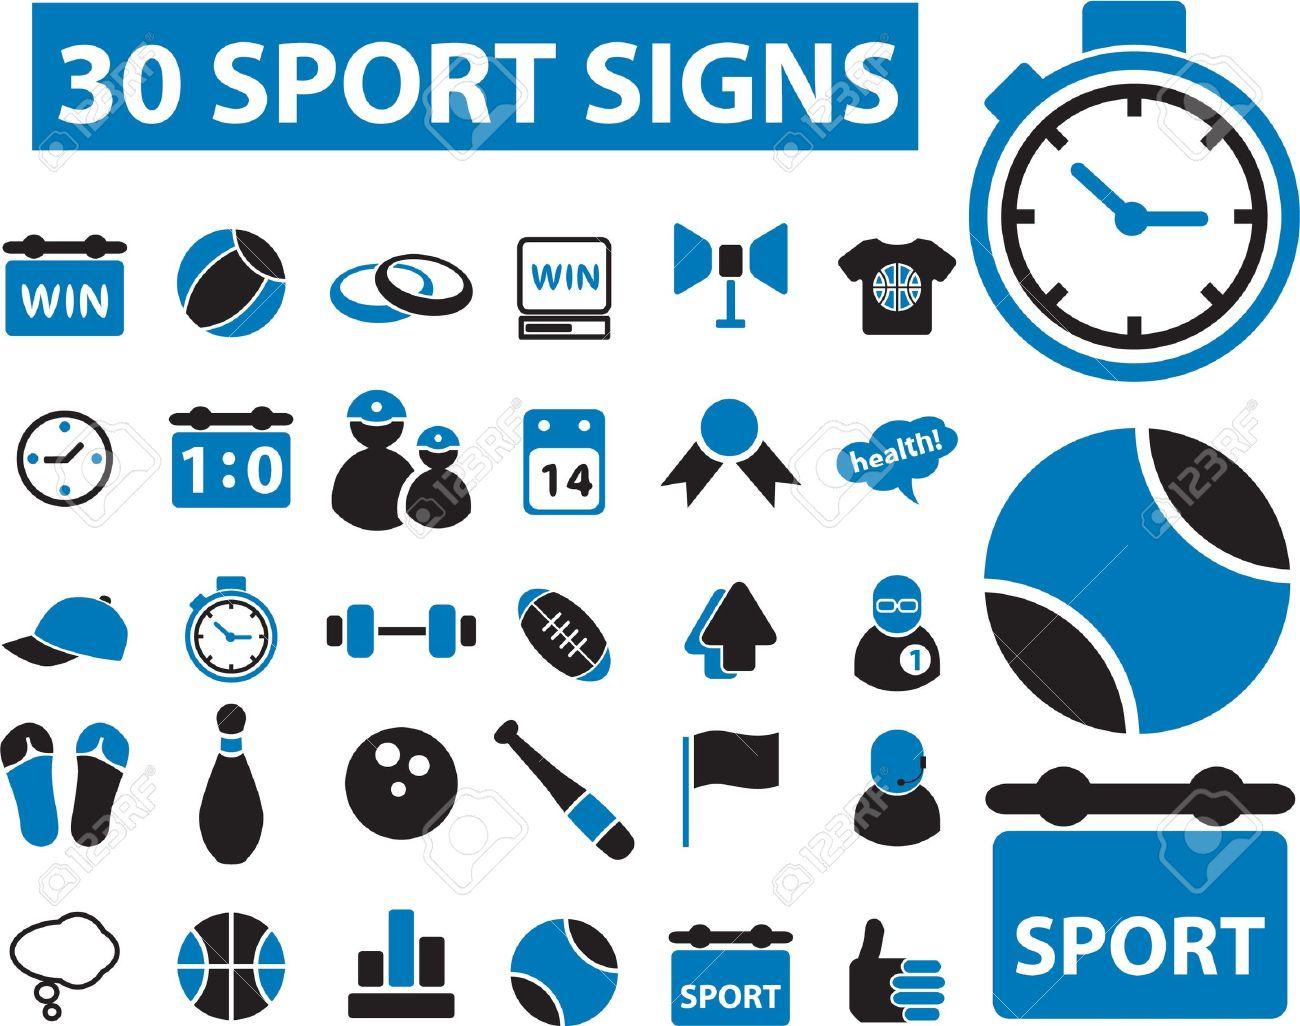 30 sport signs Stock Vector - 8905040